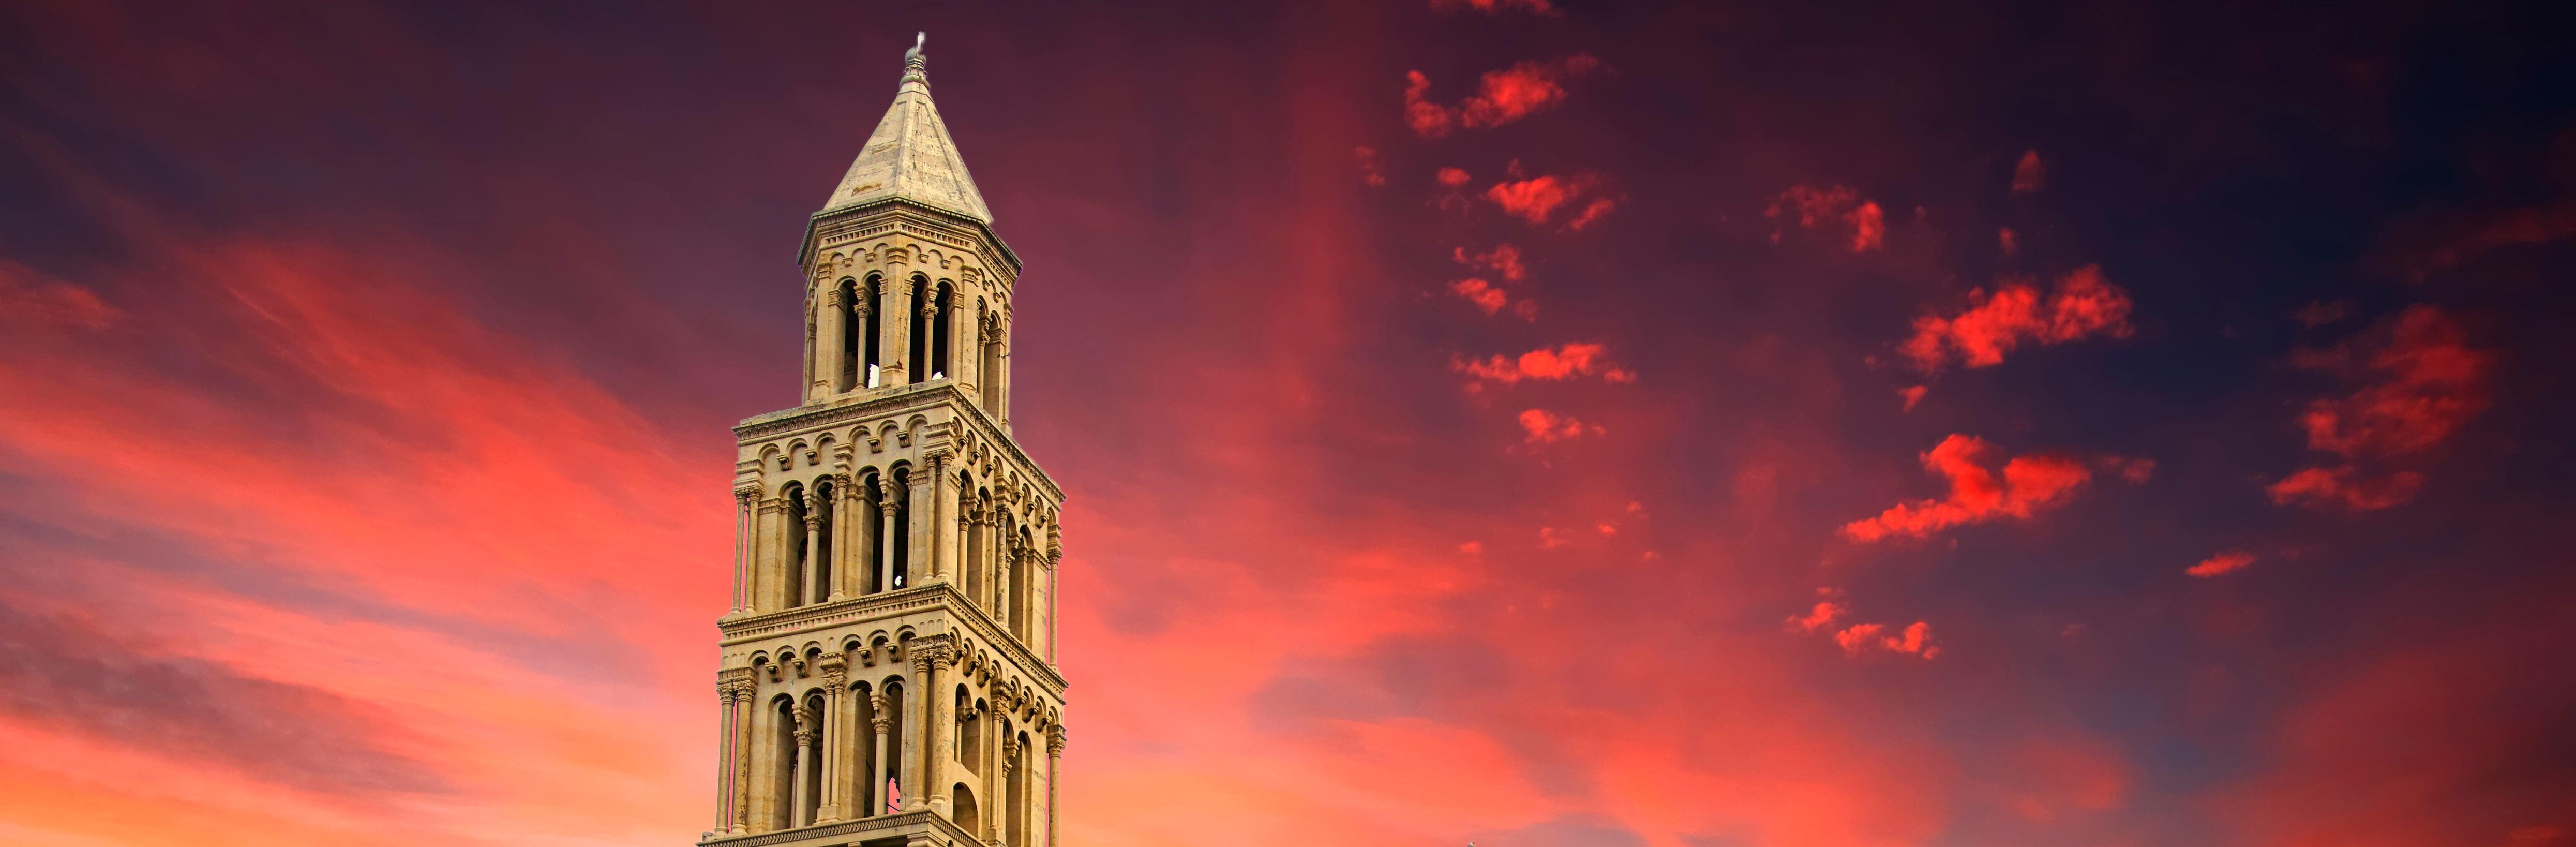 Game of Thrones Filming Locations Tour in Split, Croatia